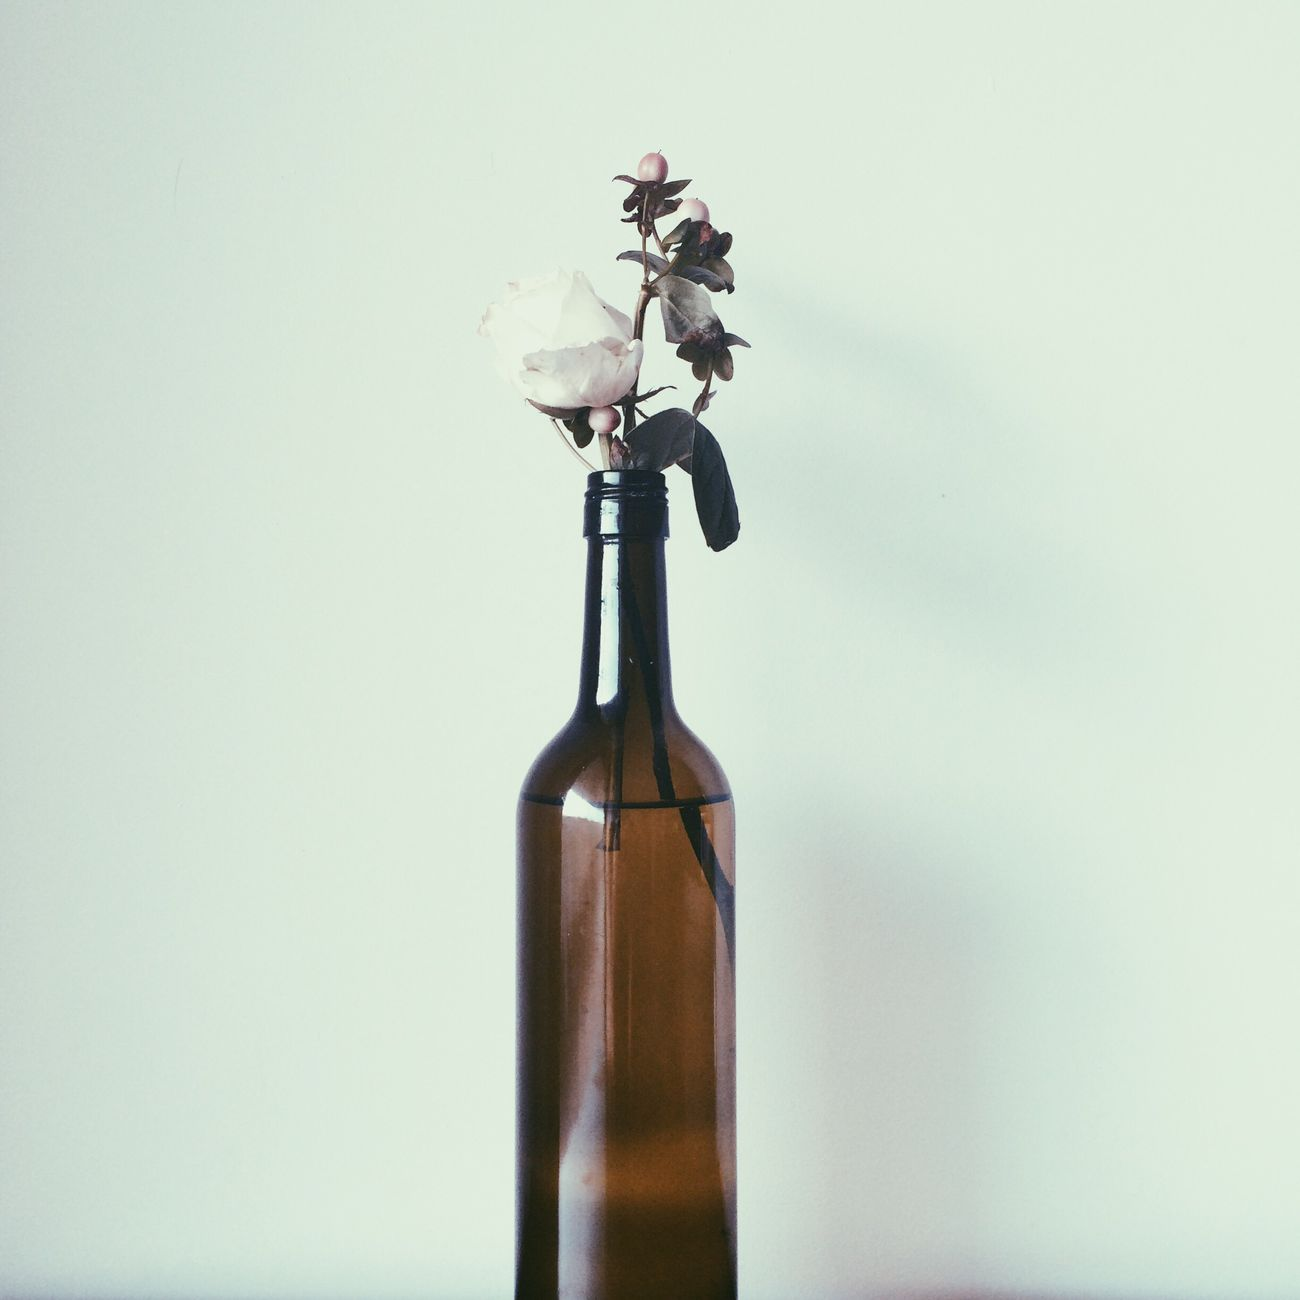 Give me Roses and Wine Roses&wine White Rose Winebotttle Decoration Decor White Wall Flower Rose🌹 Roses Flowers  Roseporn Nature_collection Interior Wall Art EyeEm Best Shots EyeEm Gallery Eye Belgium